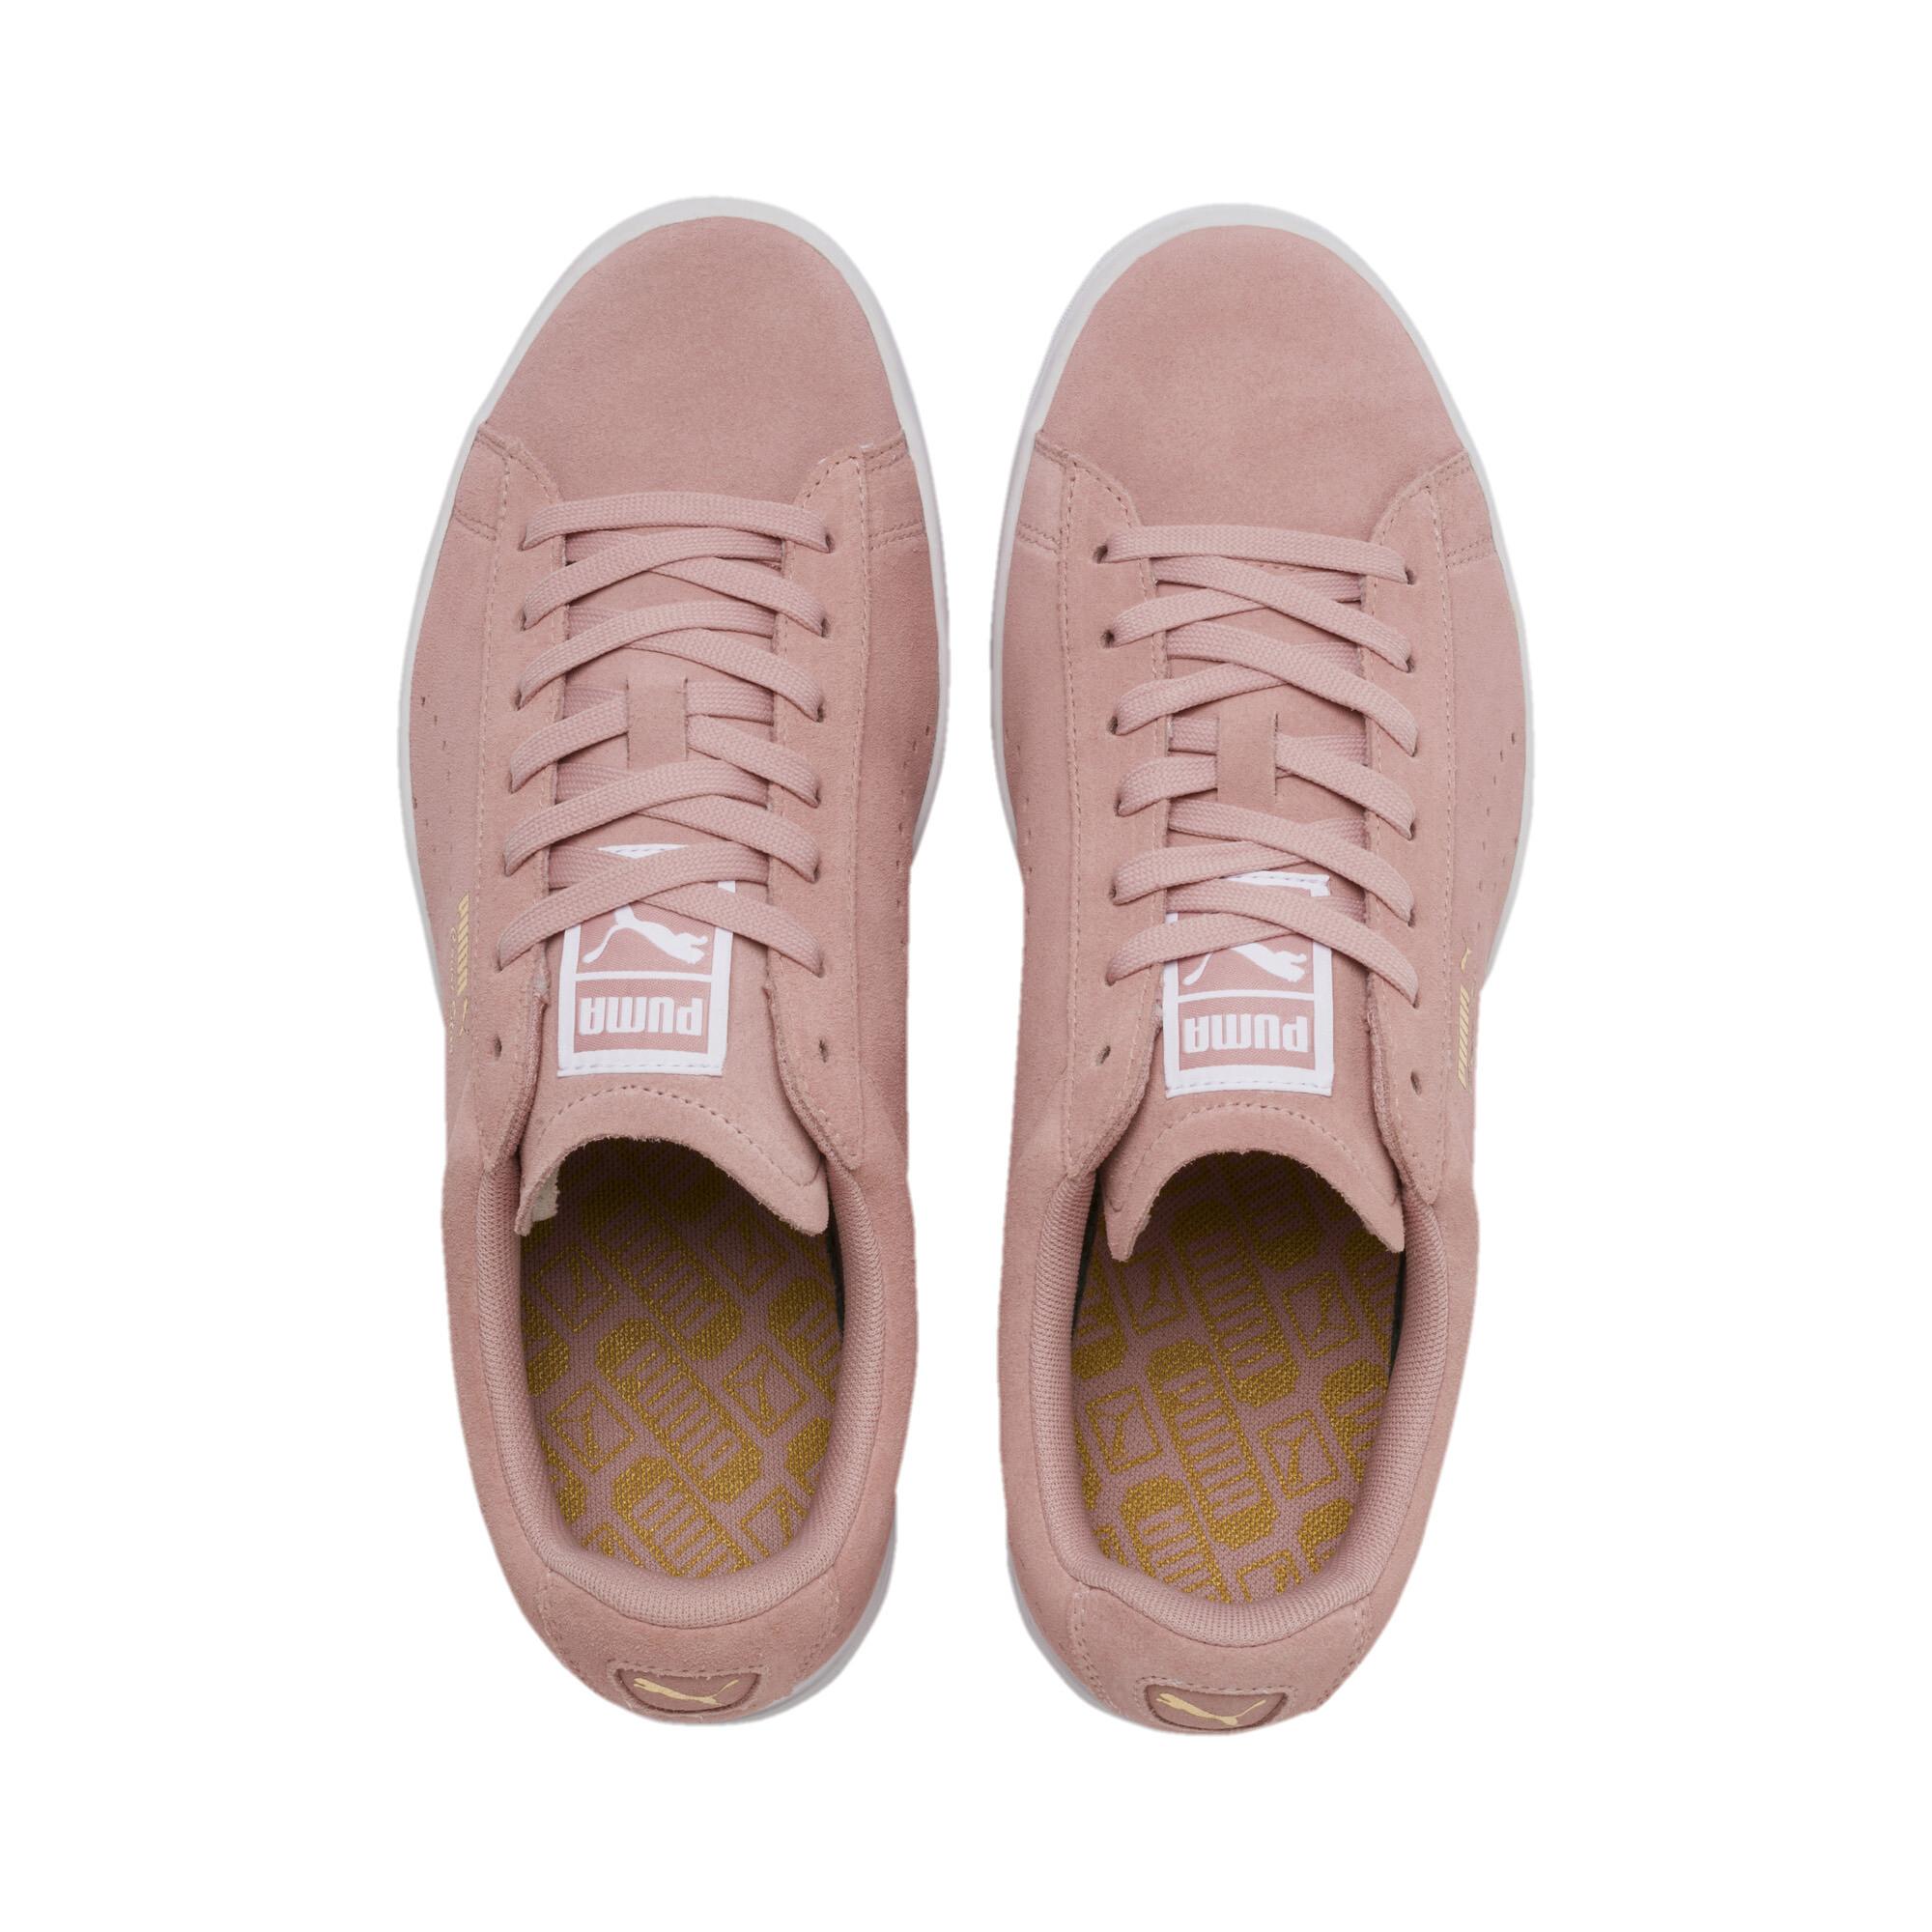 PUMA-Court-Star-Suede-Sneakers-Unisex-Shoe-Sport-Classics thumbnail 8